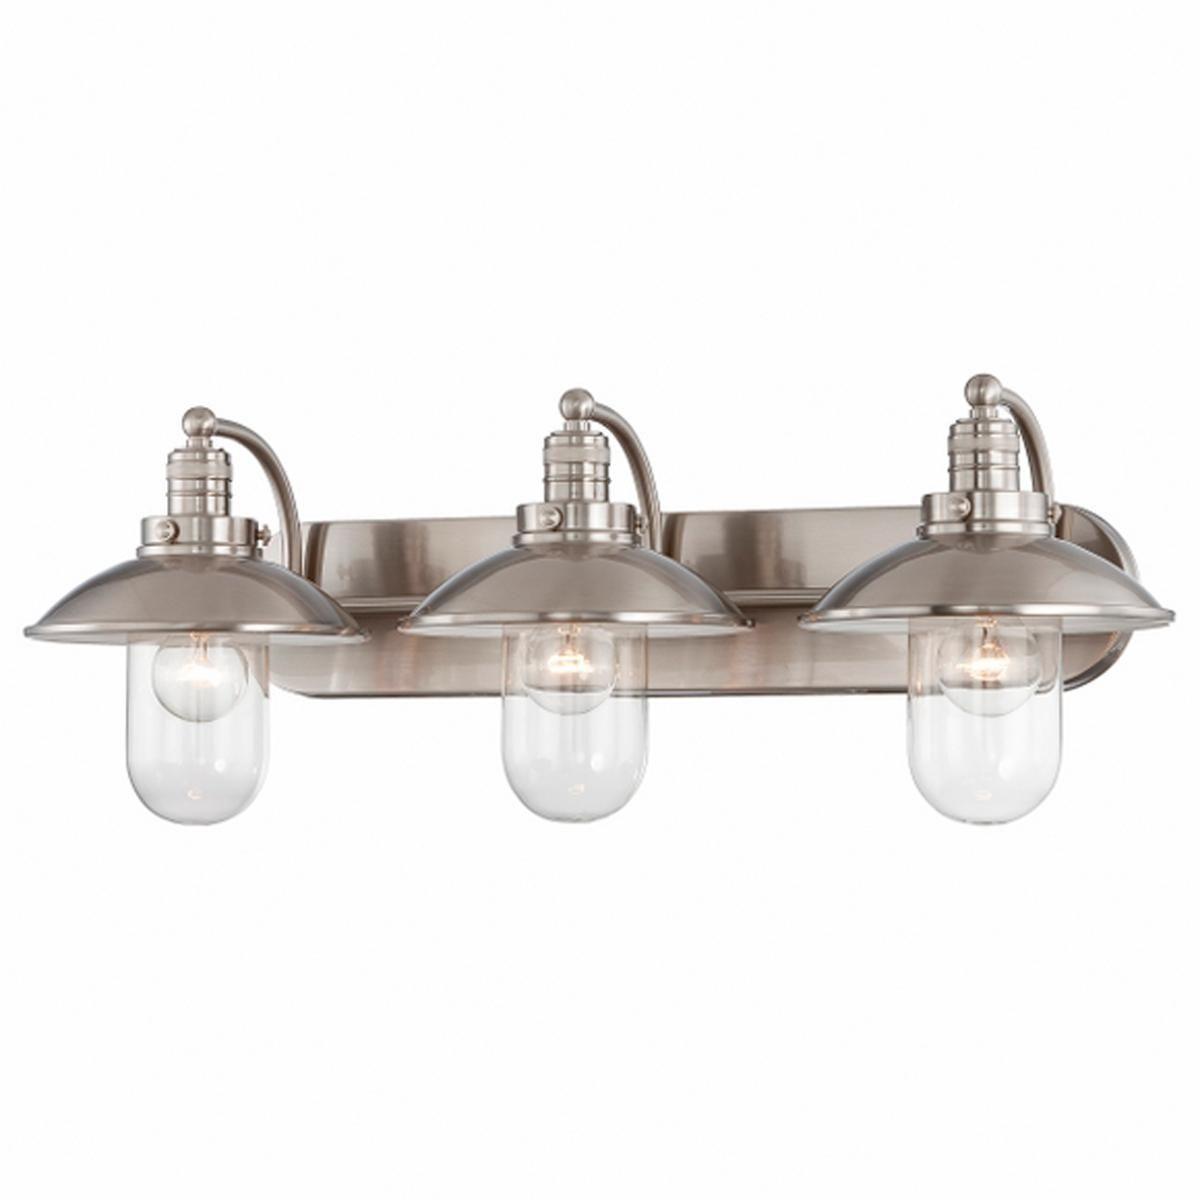 Nautical bathroom light fixtures - Schooner 3 Light Bath Light